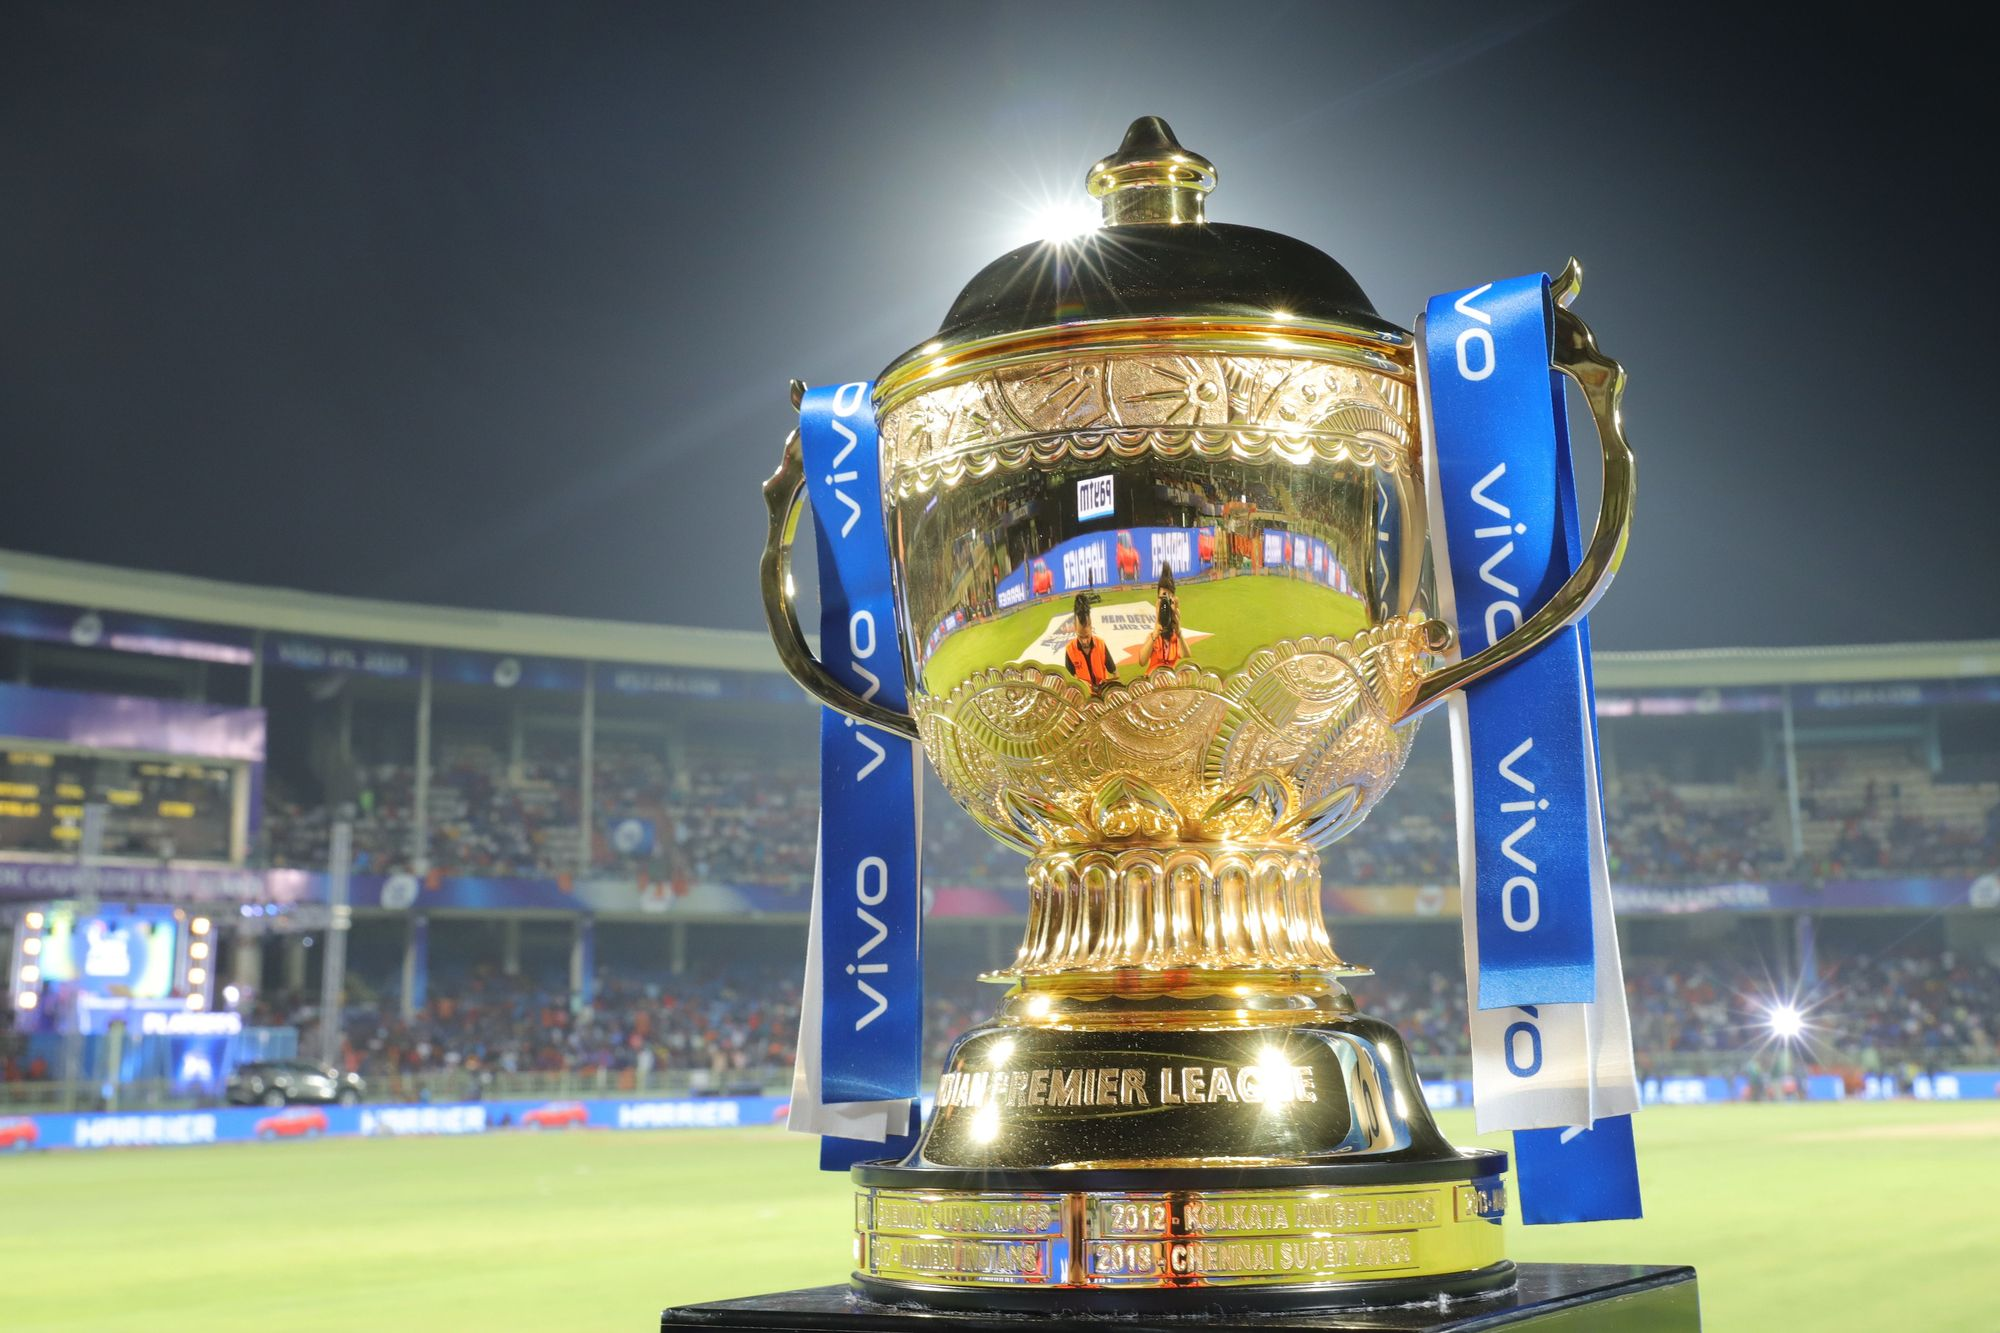 IPL 2020 Live Streaming